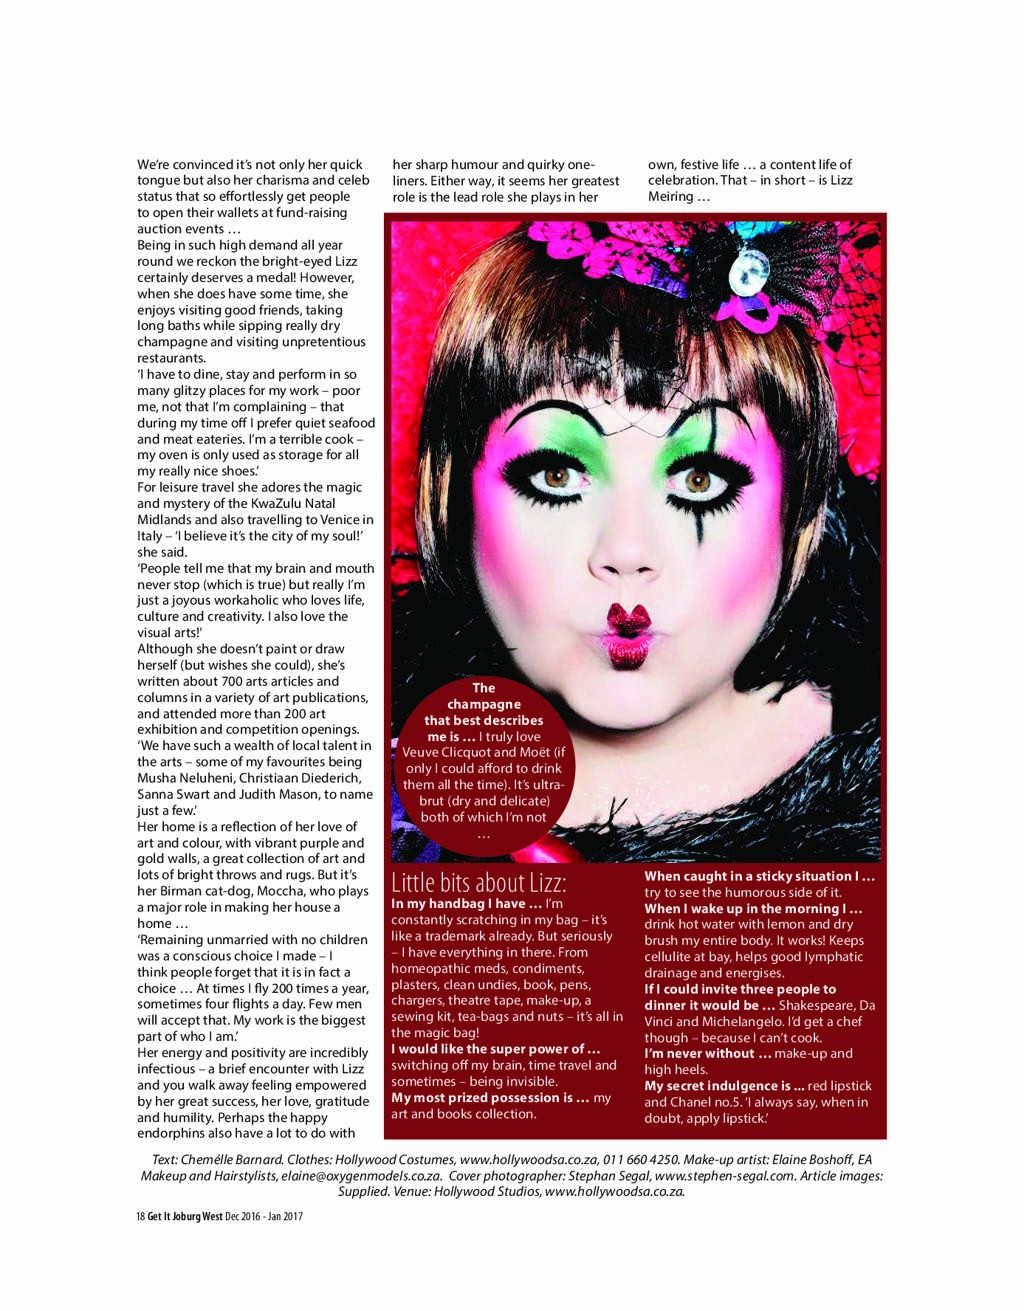 get-it-joburg-west-dec-2016-jan-2017-epapers-page-18